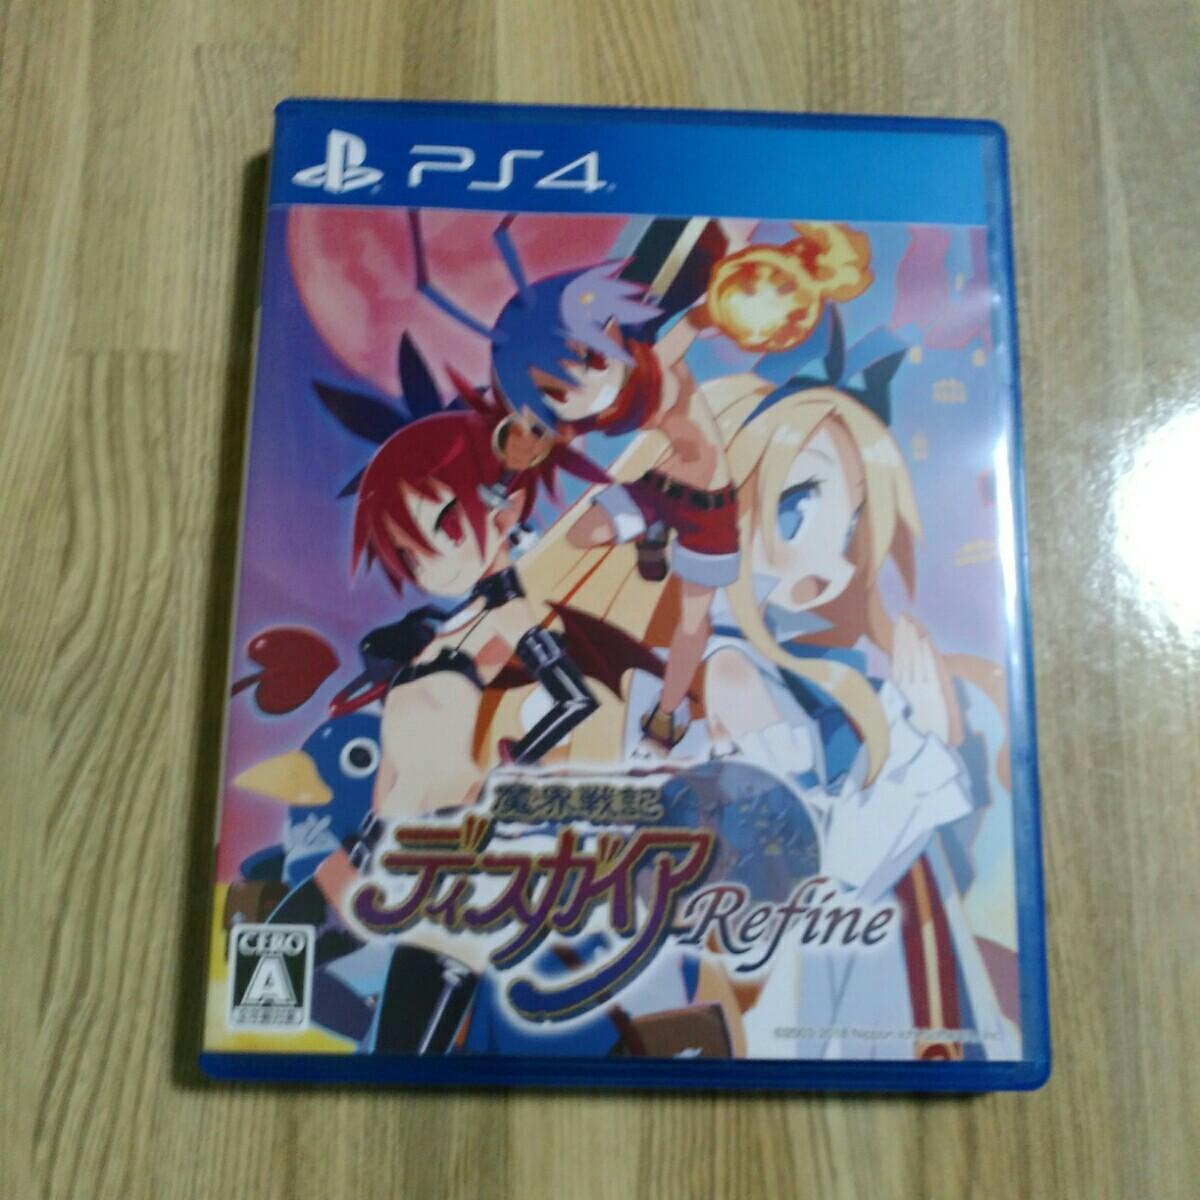 PS4 魔界戦記ディスガイア refine  ディスガイア リファイン 日本一ソフトウェア プレイステーション